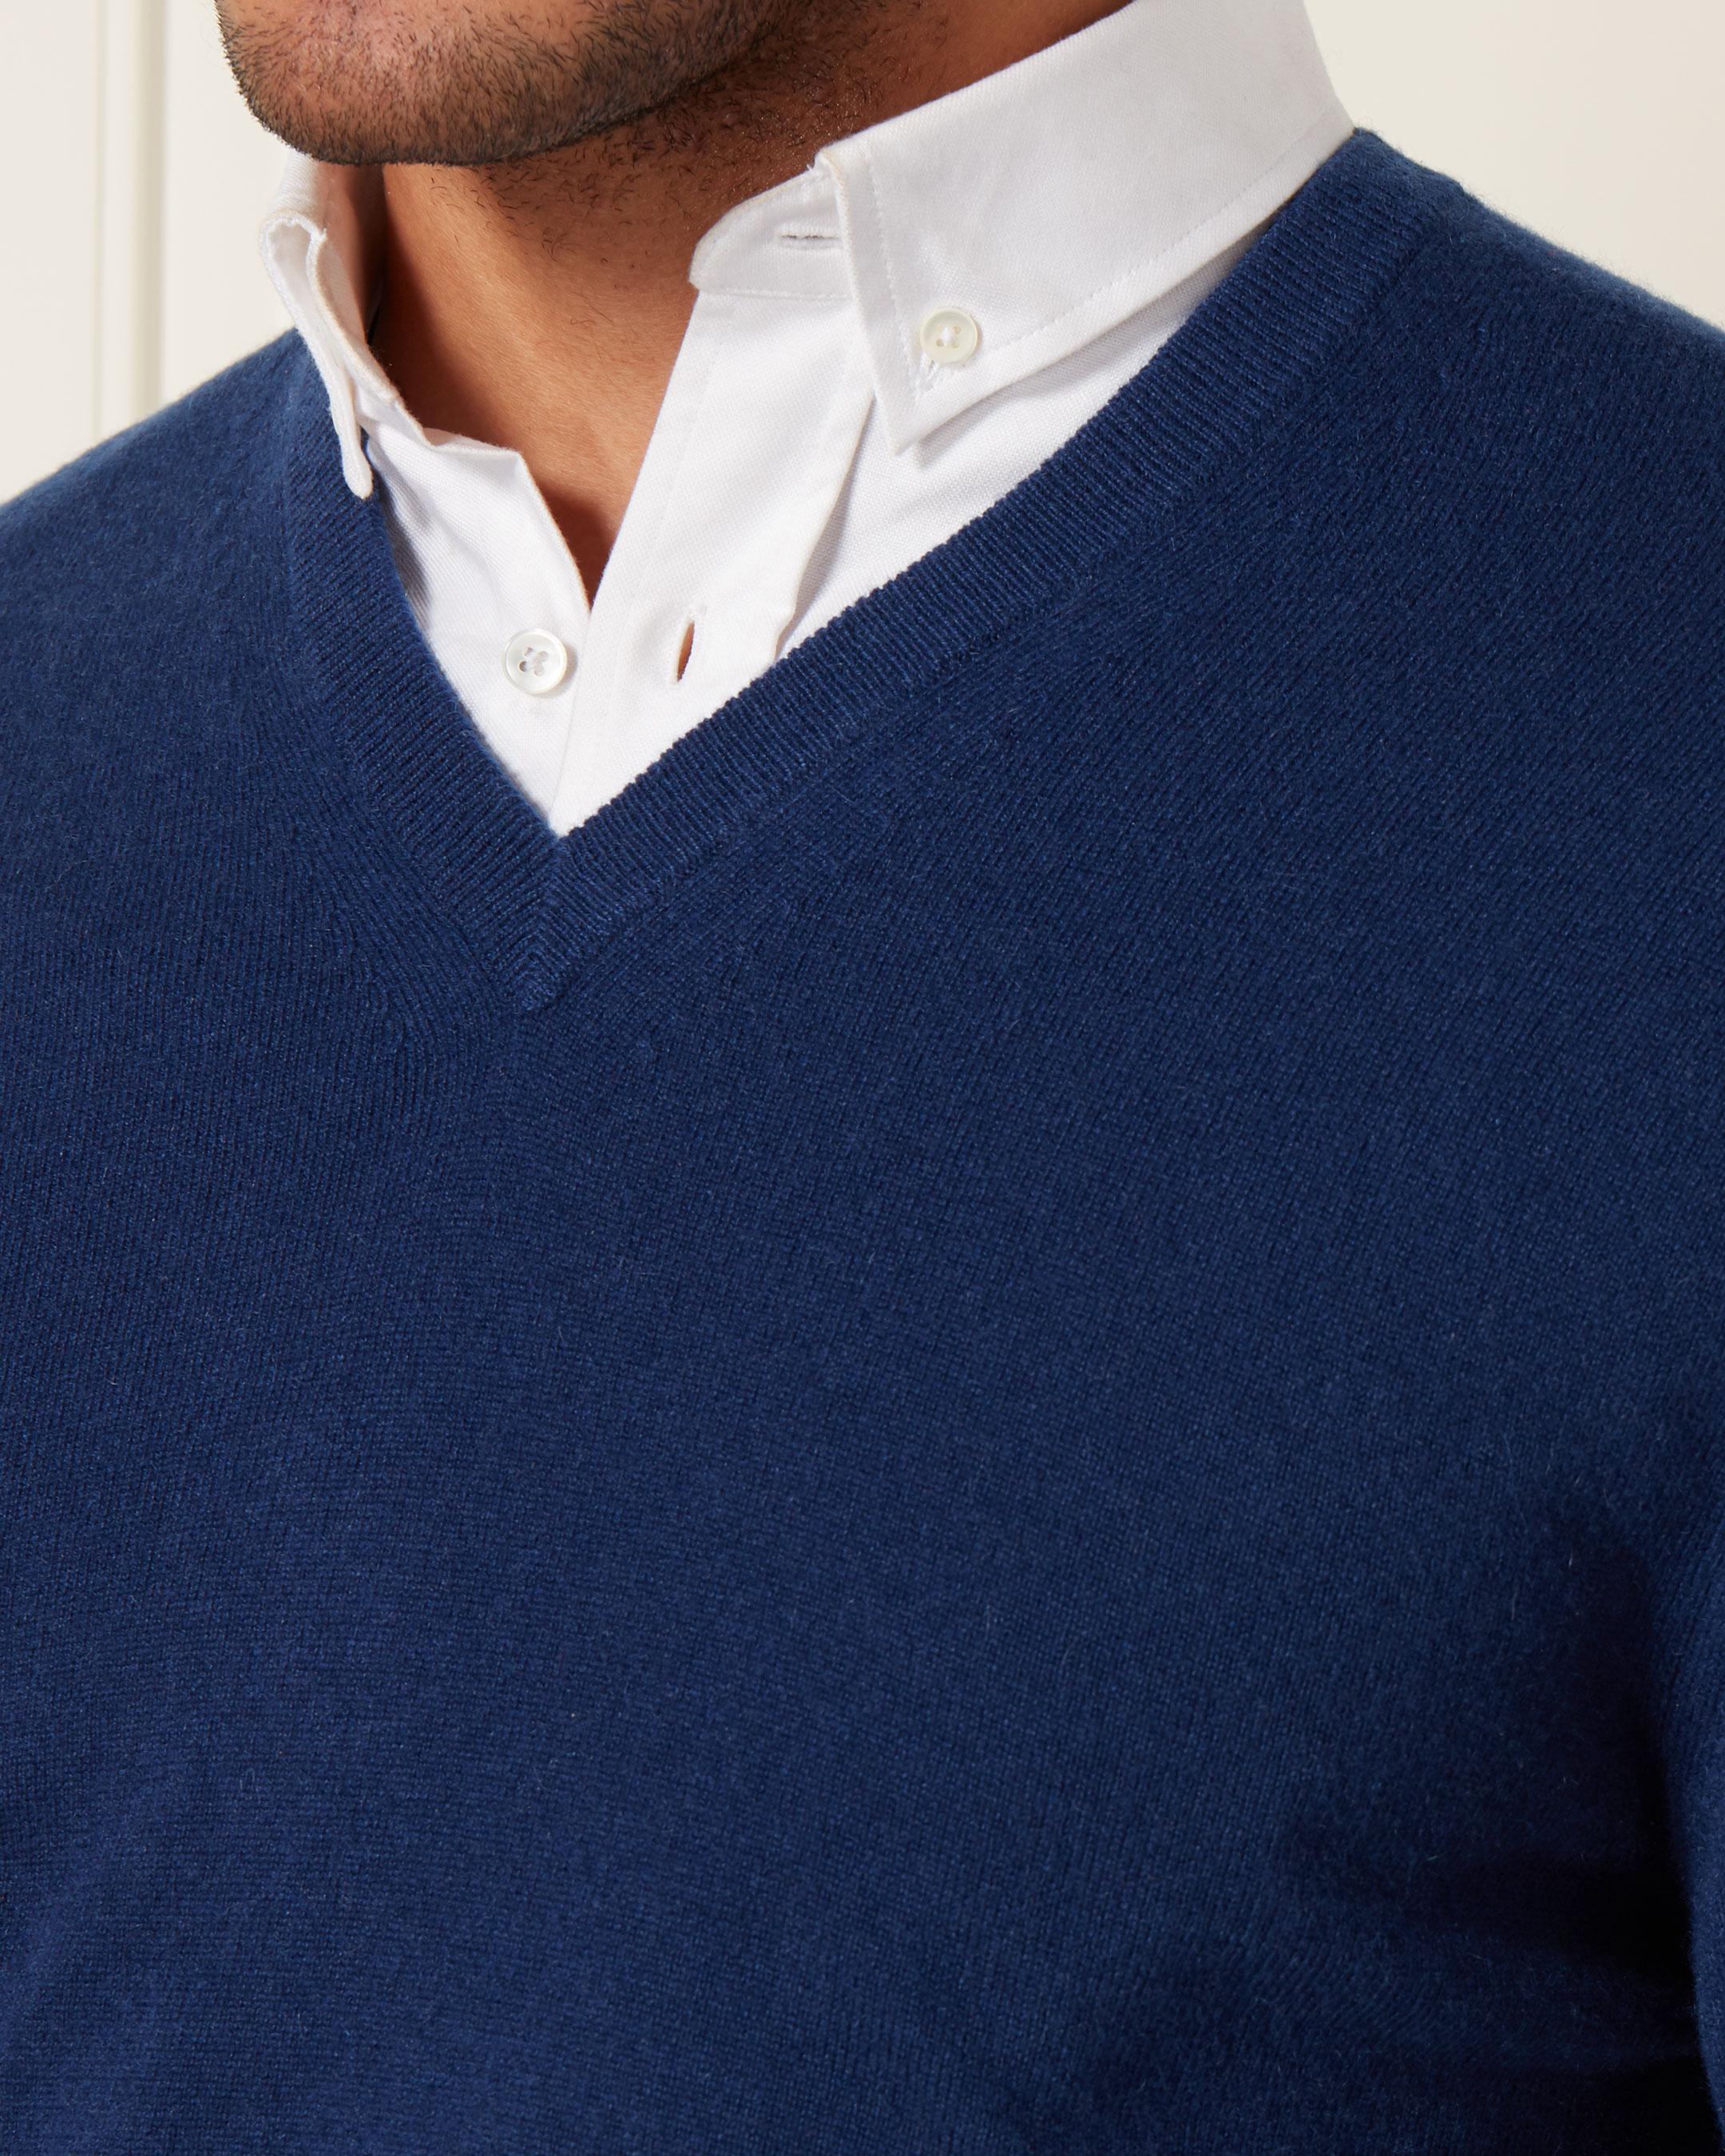 N.Peal Cashmere The Burlington V Neck 1ply Cashmere Sweater in Blue for Men